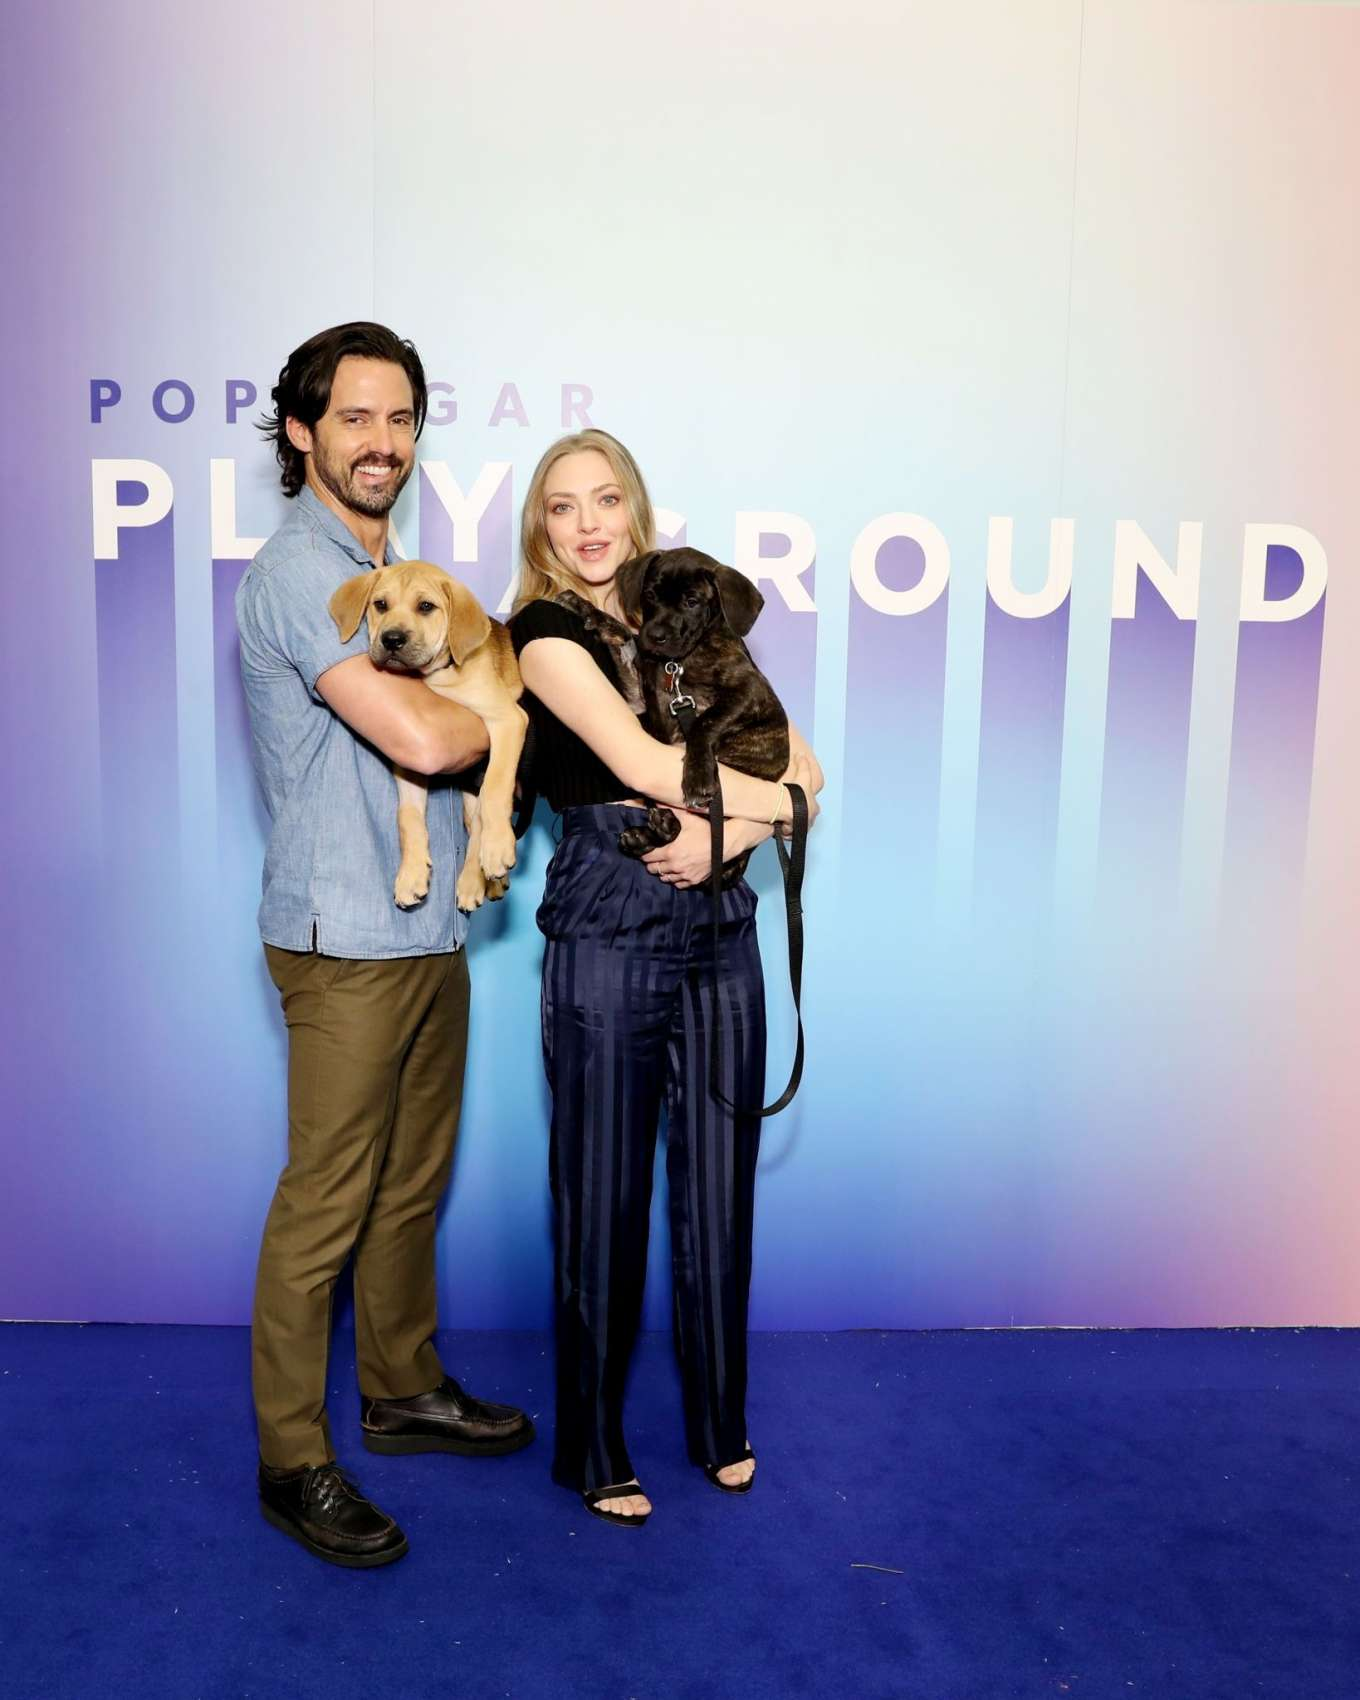 Amanda Seyfried and Milo Ventimiglia - POPSUGAR Play/Ground 2019 in NYC